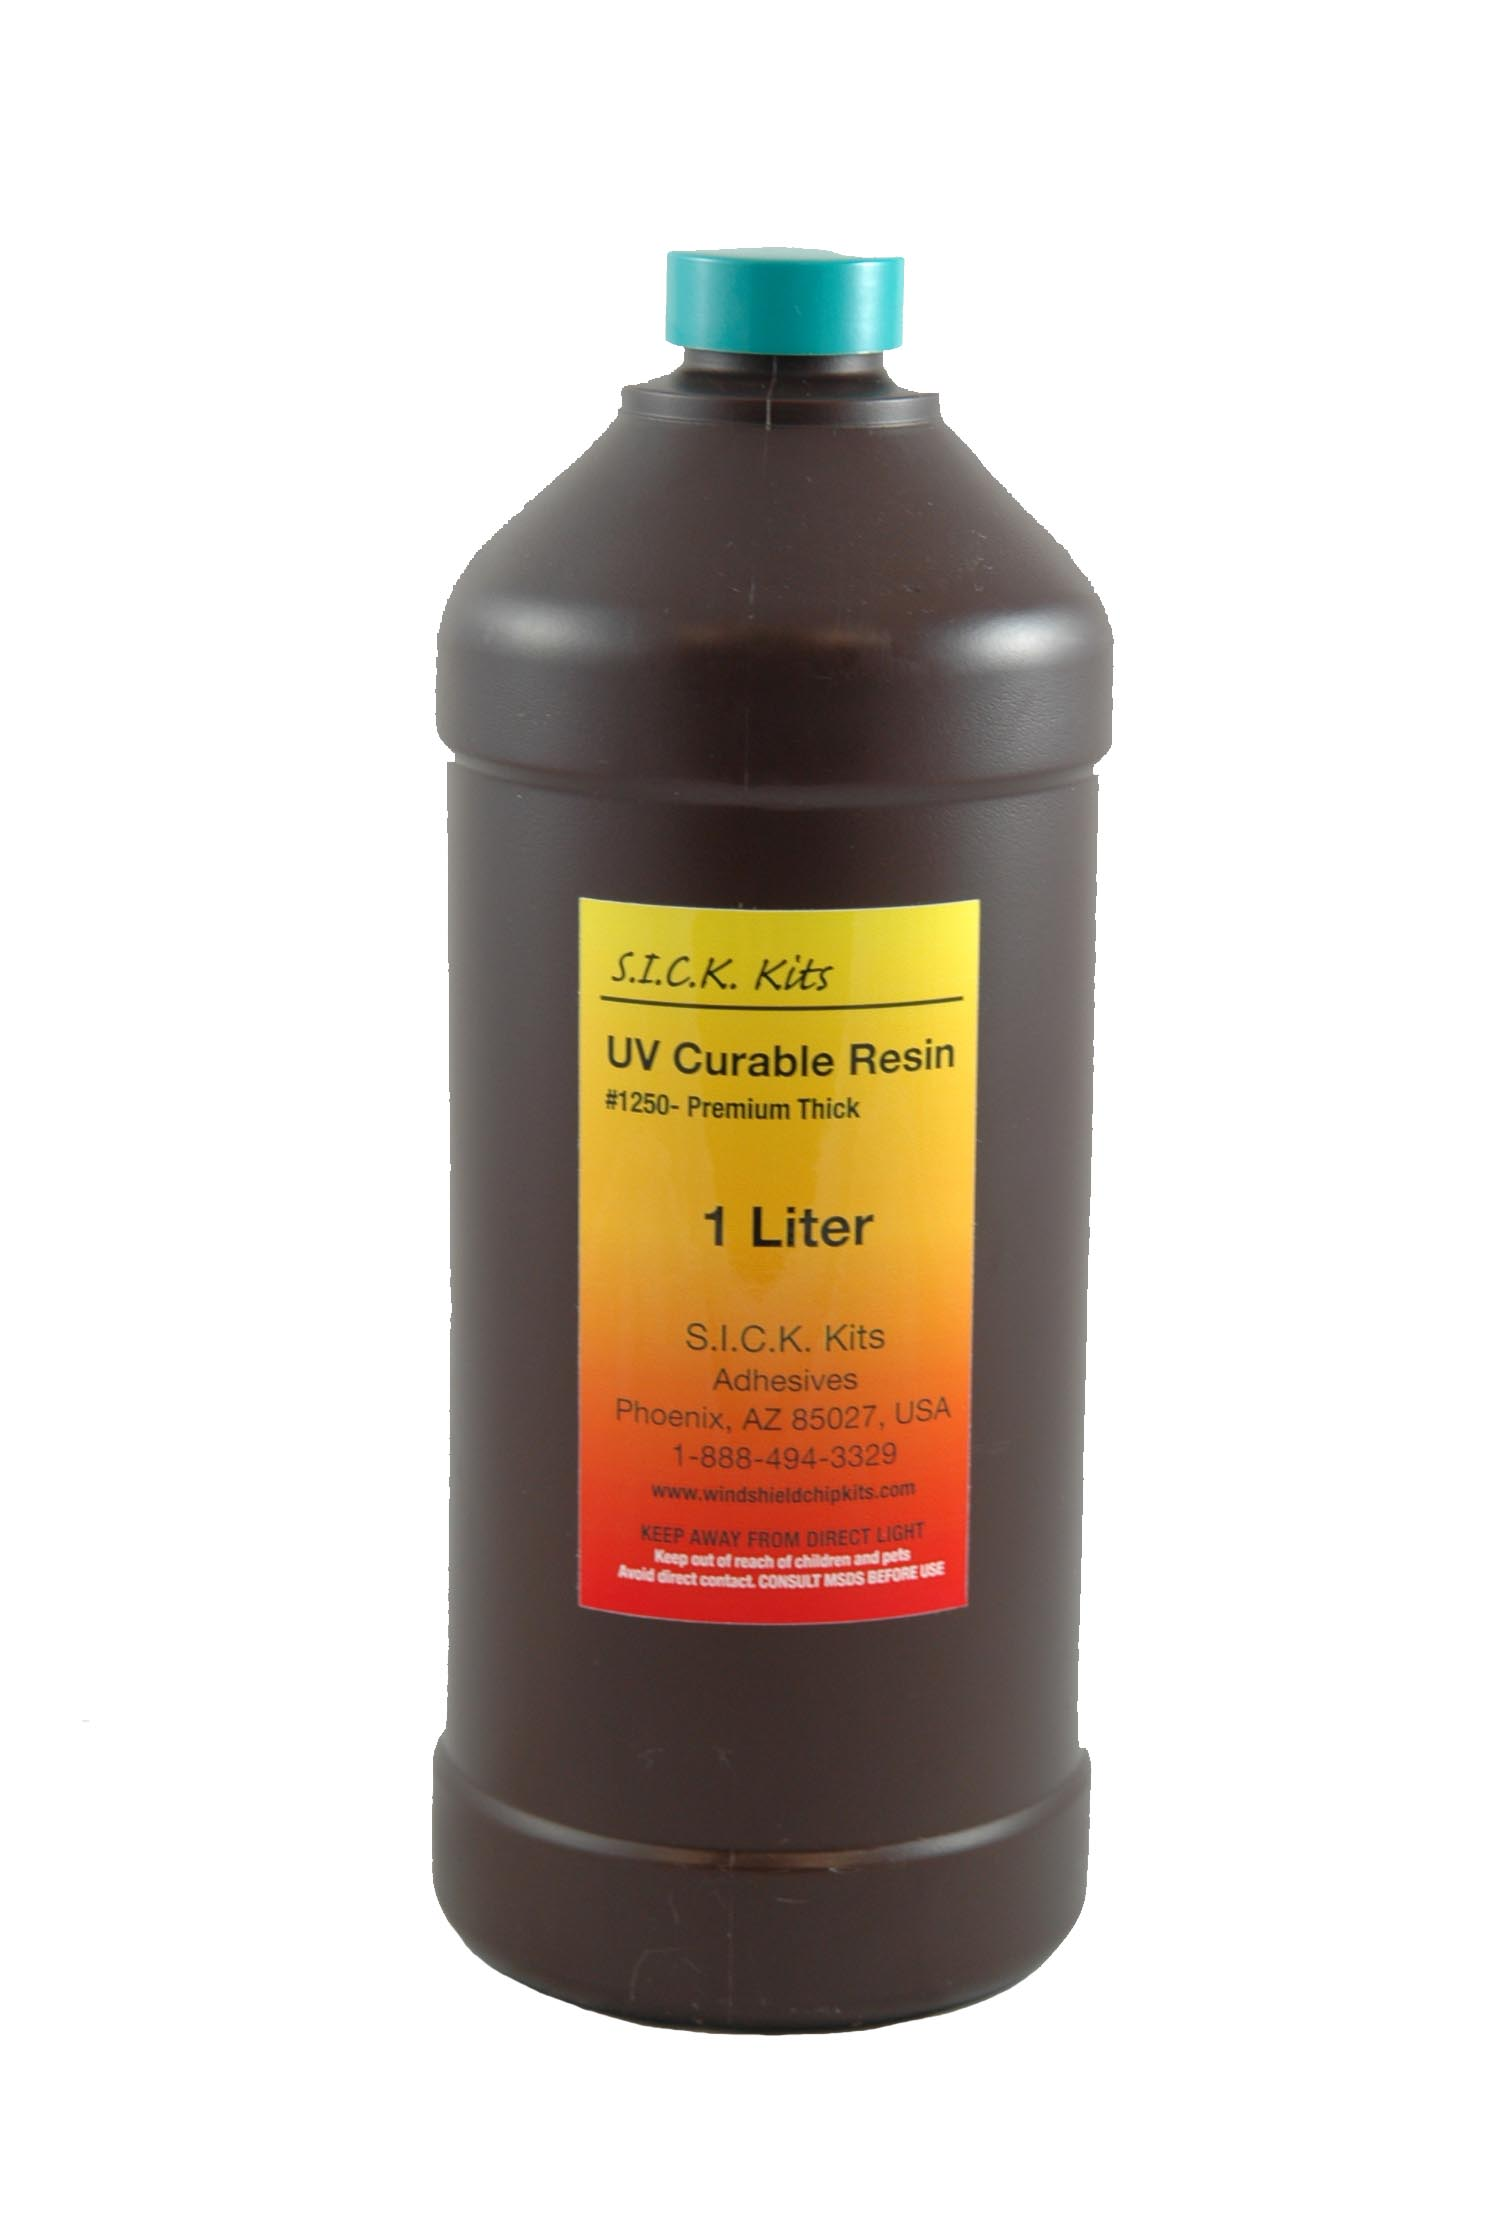 S.I.C.K. Kits PowerBond Resin Premium Thick (1 Liter Pit Filler)